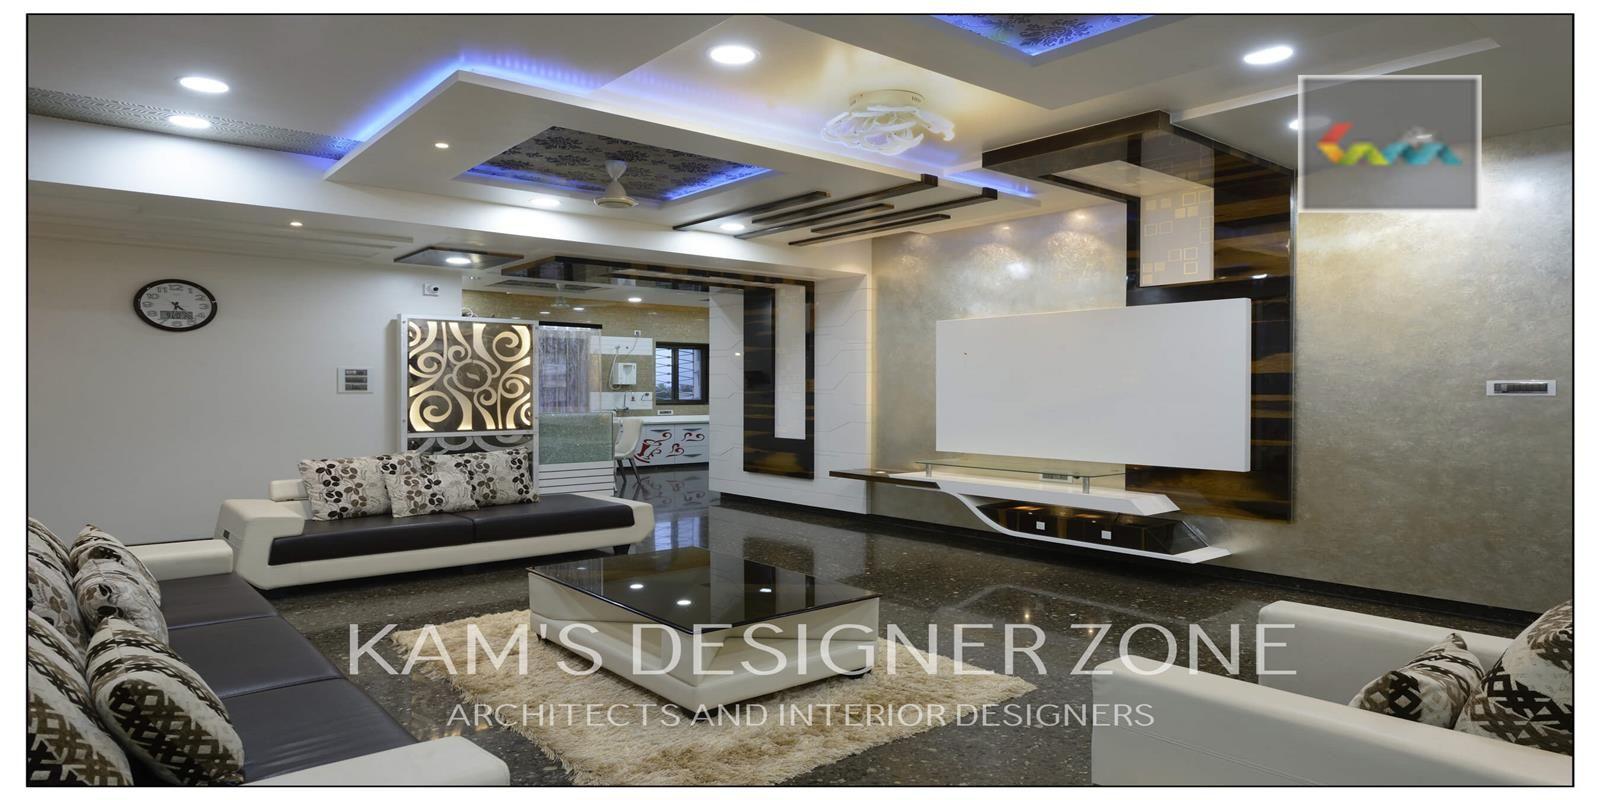 Best Interior Designer In Vishrantwadi Kams Designer